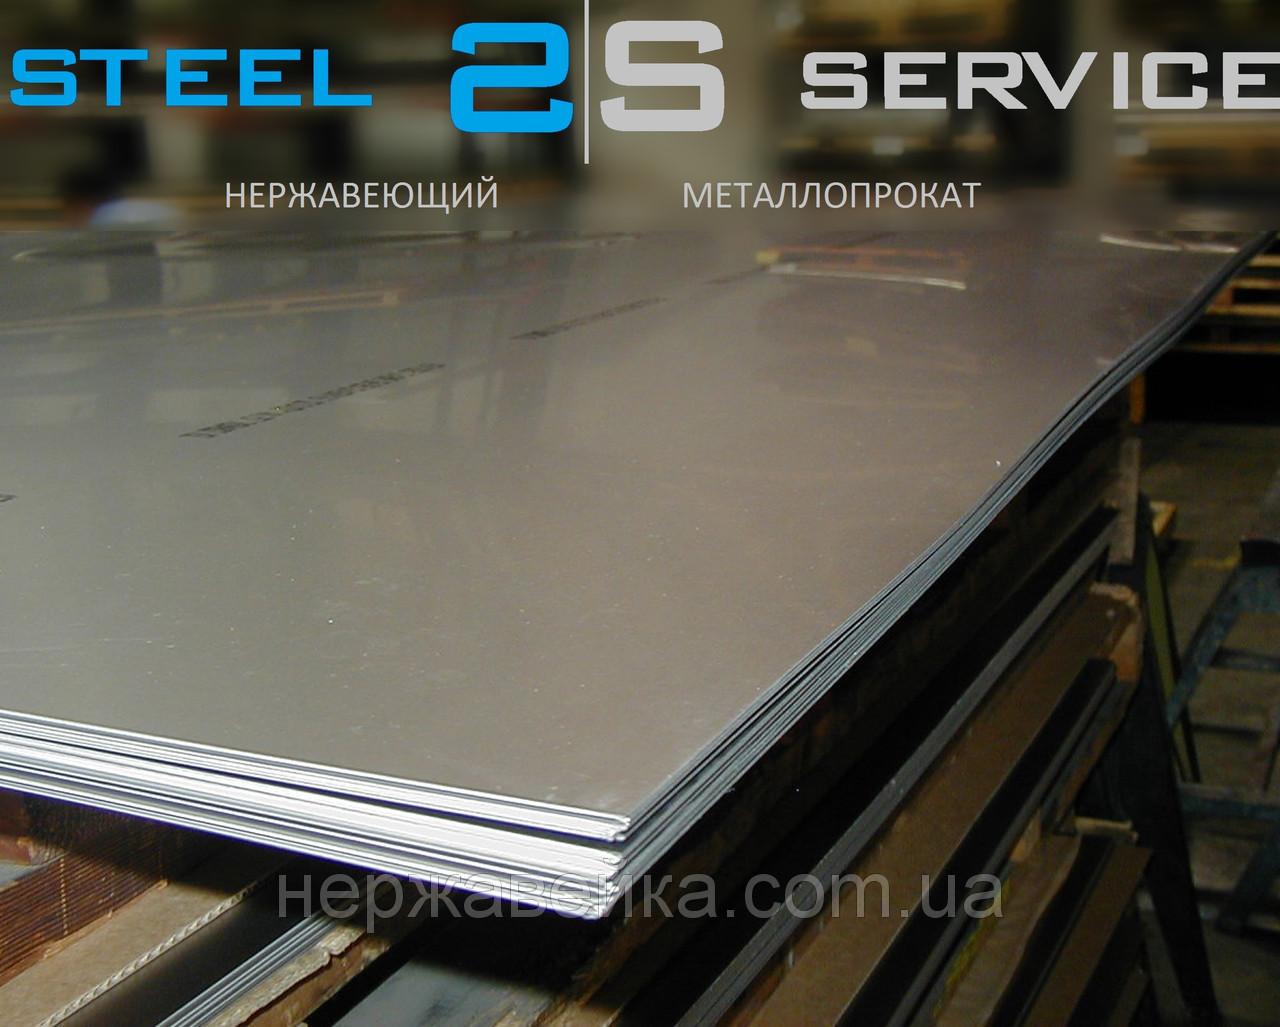 Нержавейка лист 12х1500х3000мм  AISI 316Ti(10Х17Н13М2Т) F1 - горячекатанный,  кислотостойкий